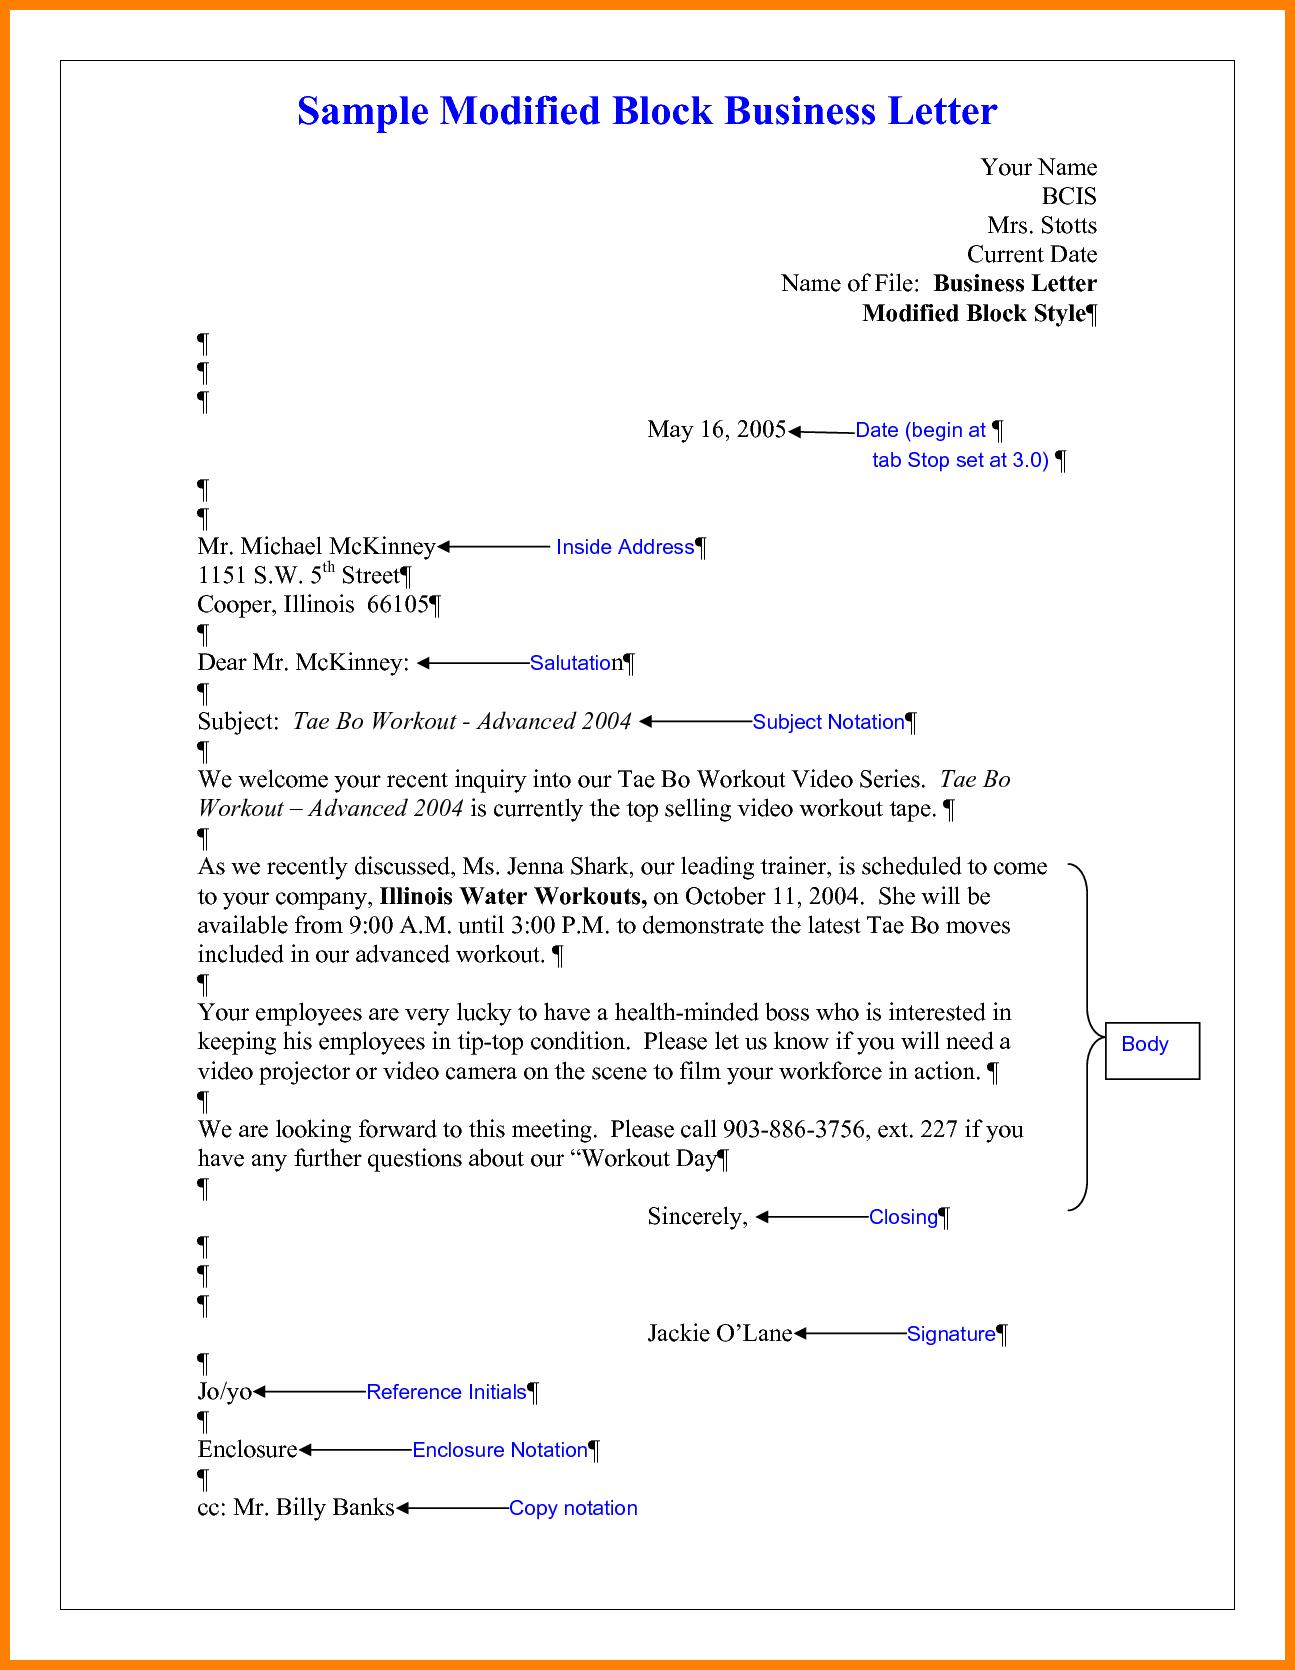 Business Letter Modified Block Style Format Best Regarding